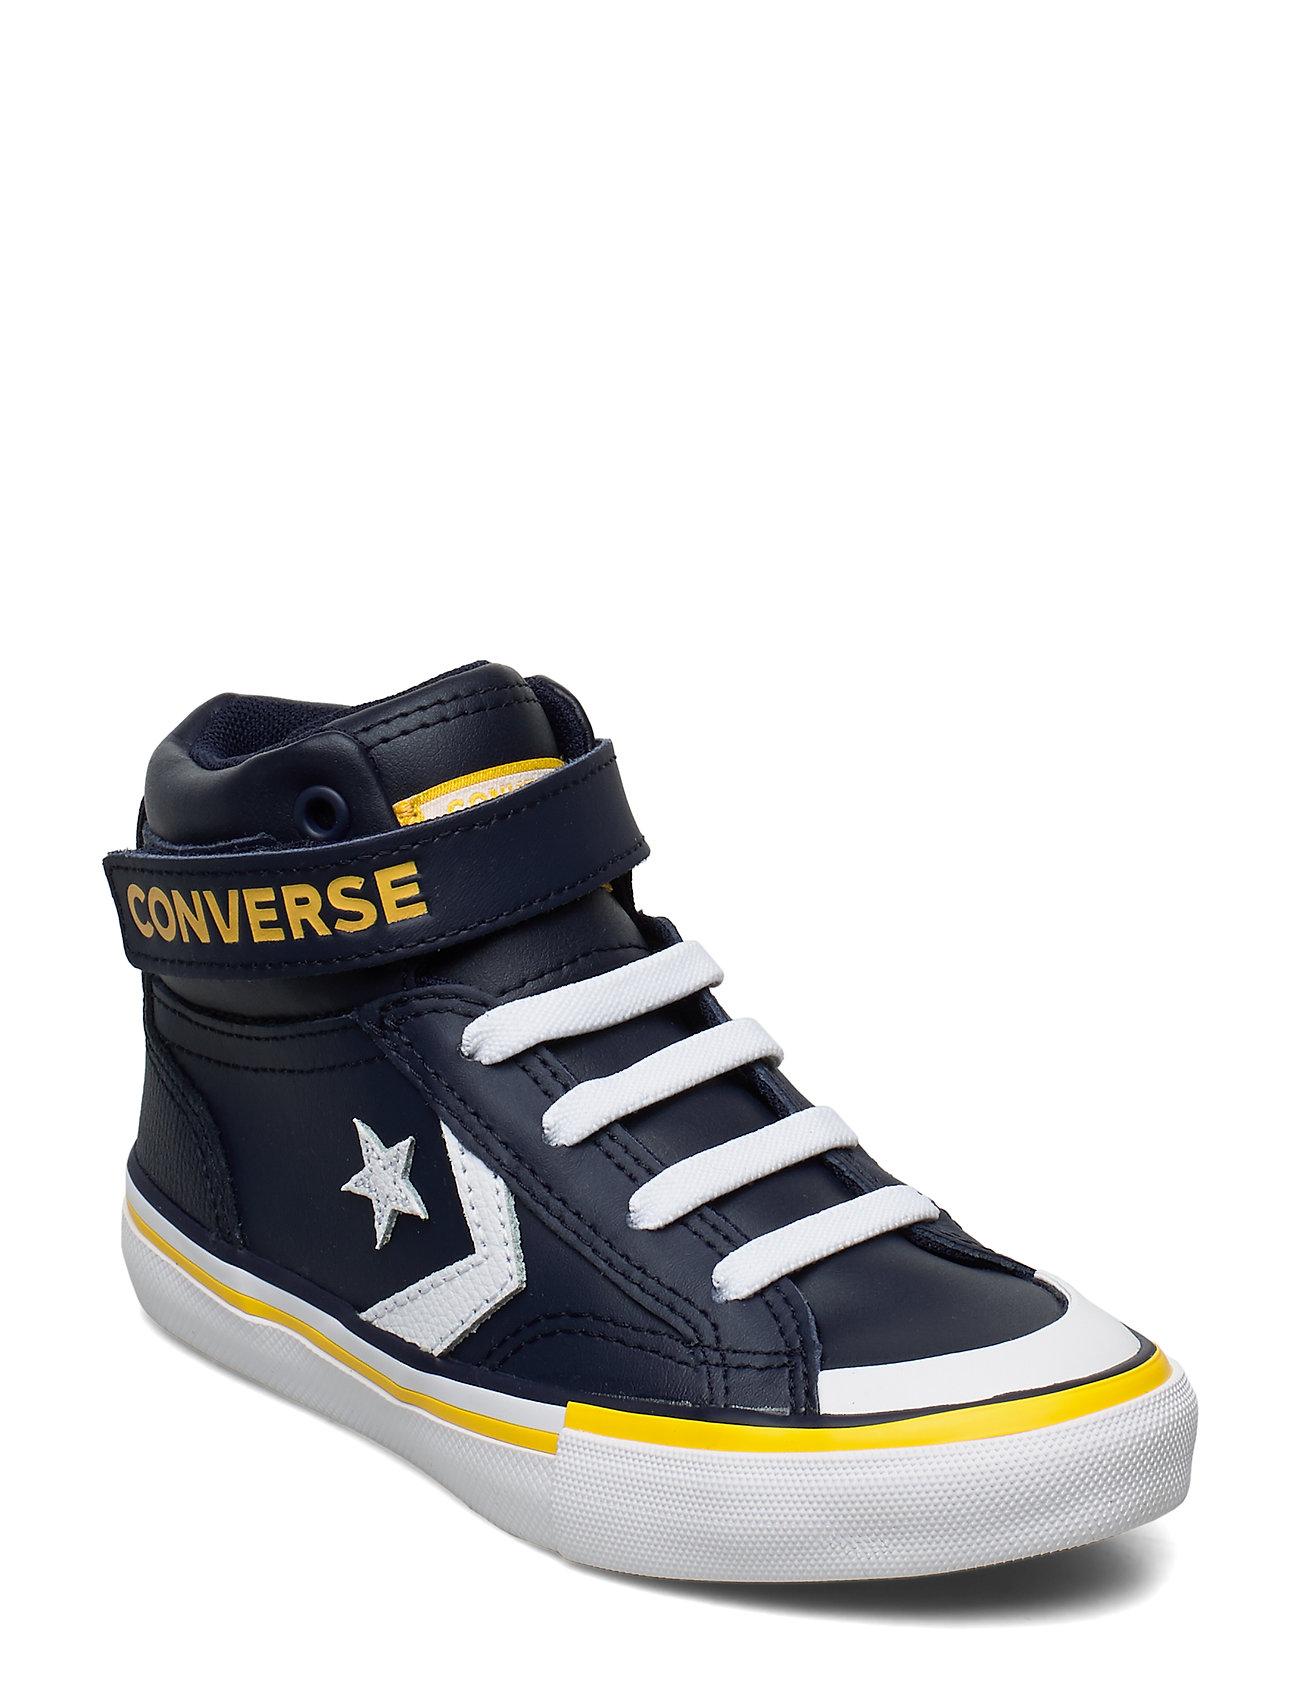 Converse PRO BLAZE STRAP HI OBSIDIAN/AMARILLO - OBSIDIAN/AMARILLO/WHITE